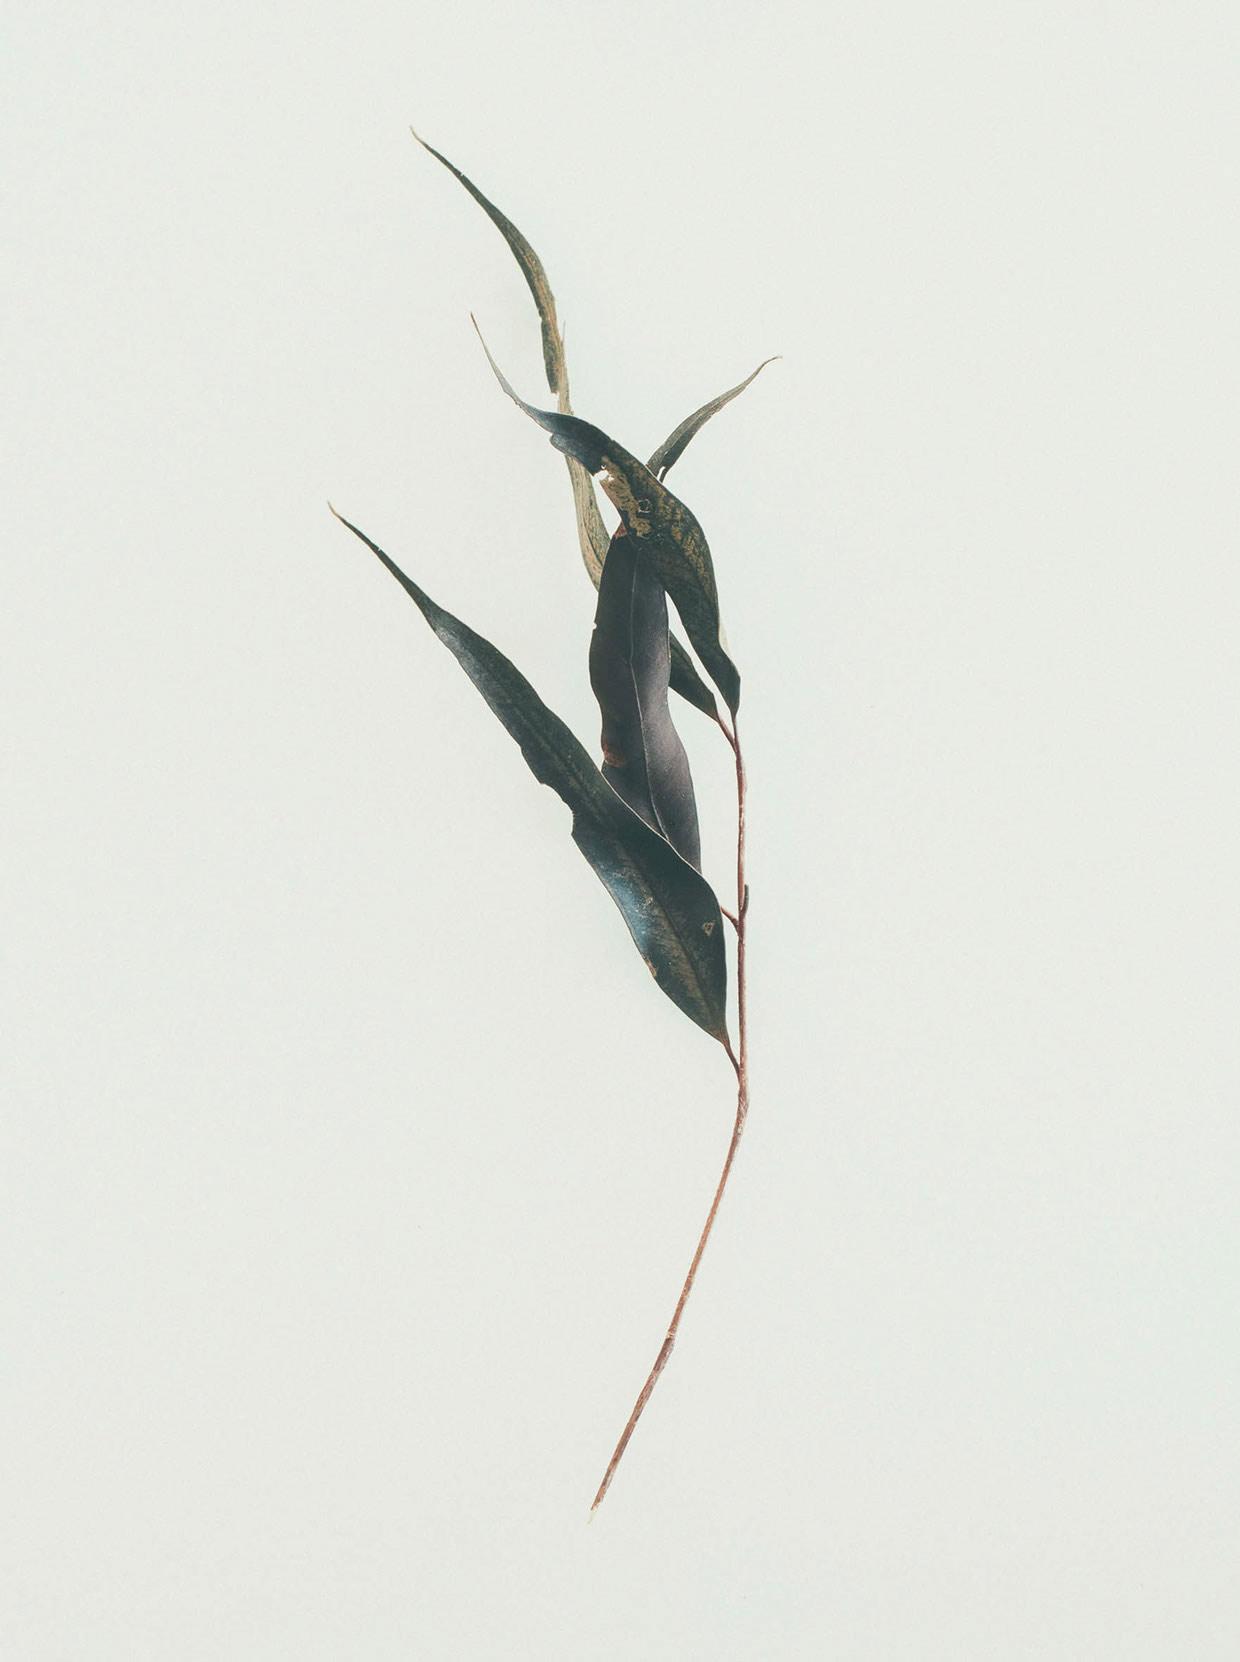 jared-fowler06